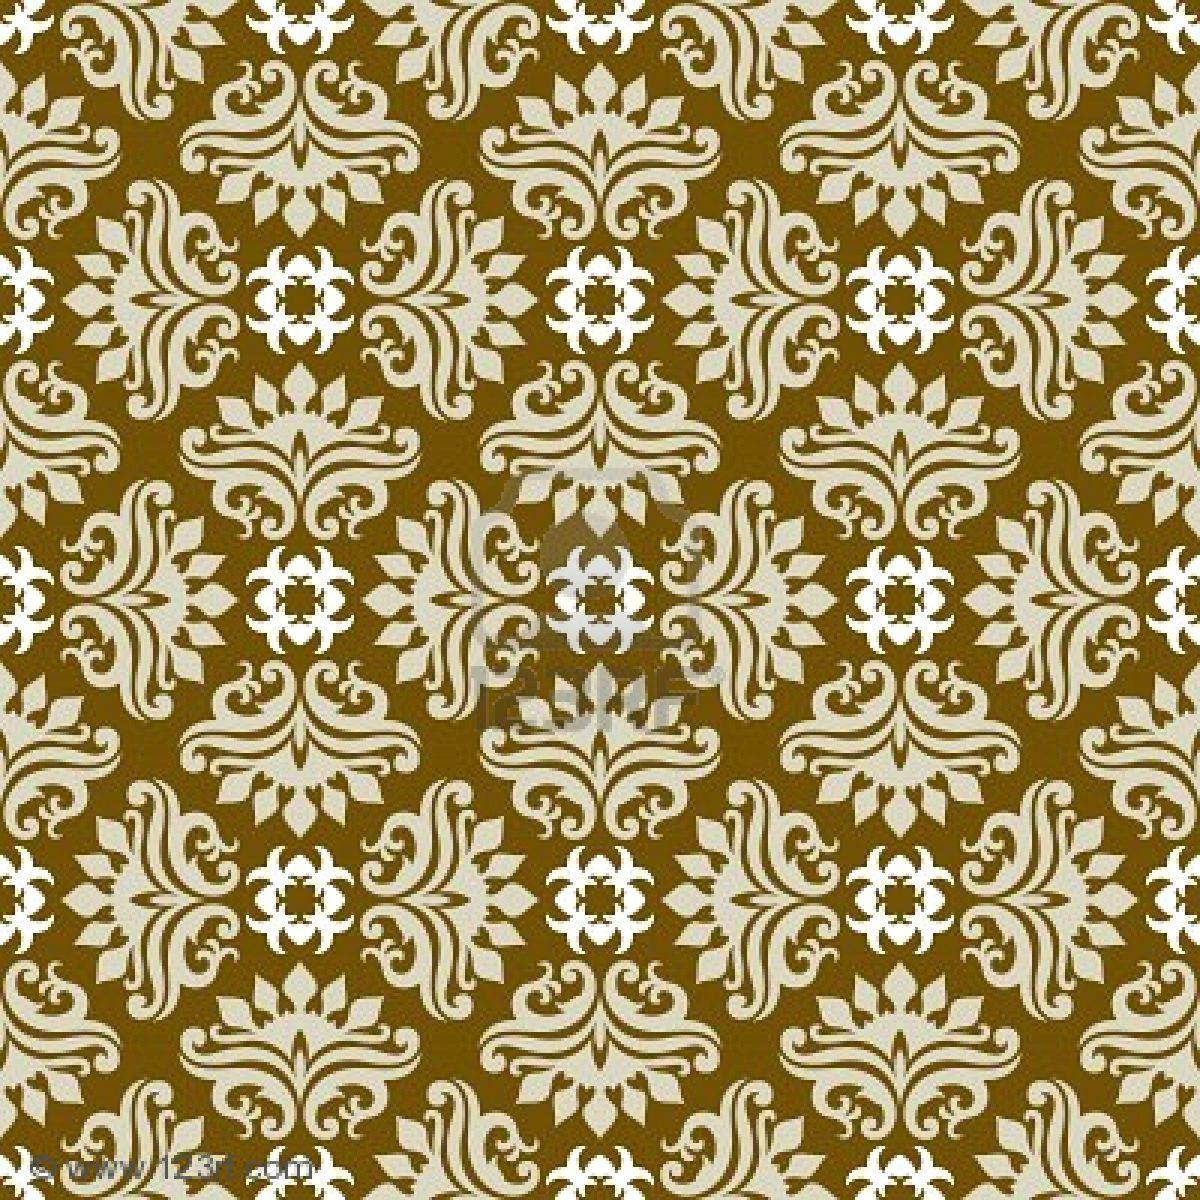 http://1.bp.blogspot.com/_SDwNwMYVNqs/TT9-OpcaSTI/AAAAAAAAAMU/1cZ8V67Kjwg/s1600/7011456-seamless-background-from-a-floral-ornament-fashionable-modern-wallpaper-or-textile.jpg